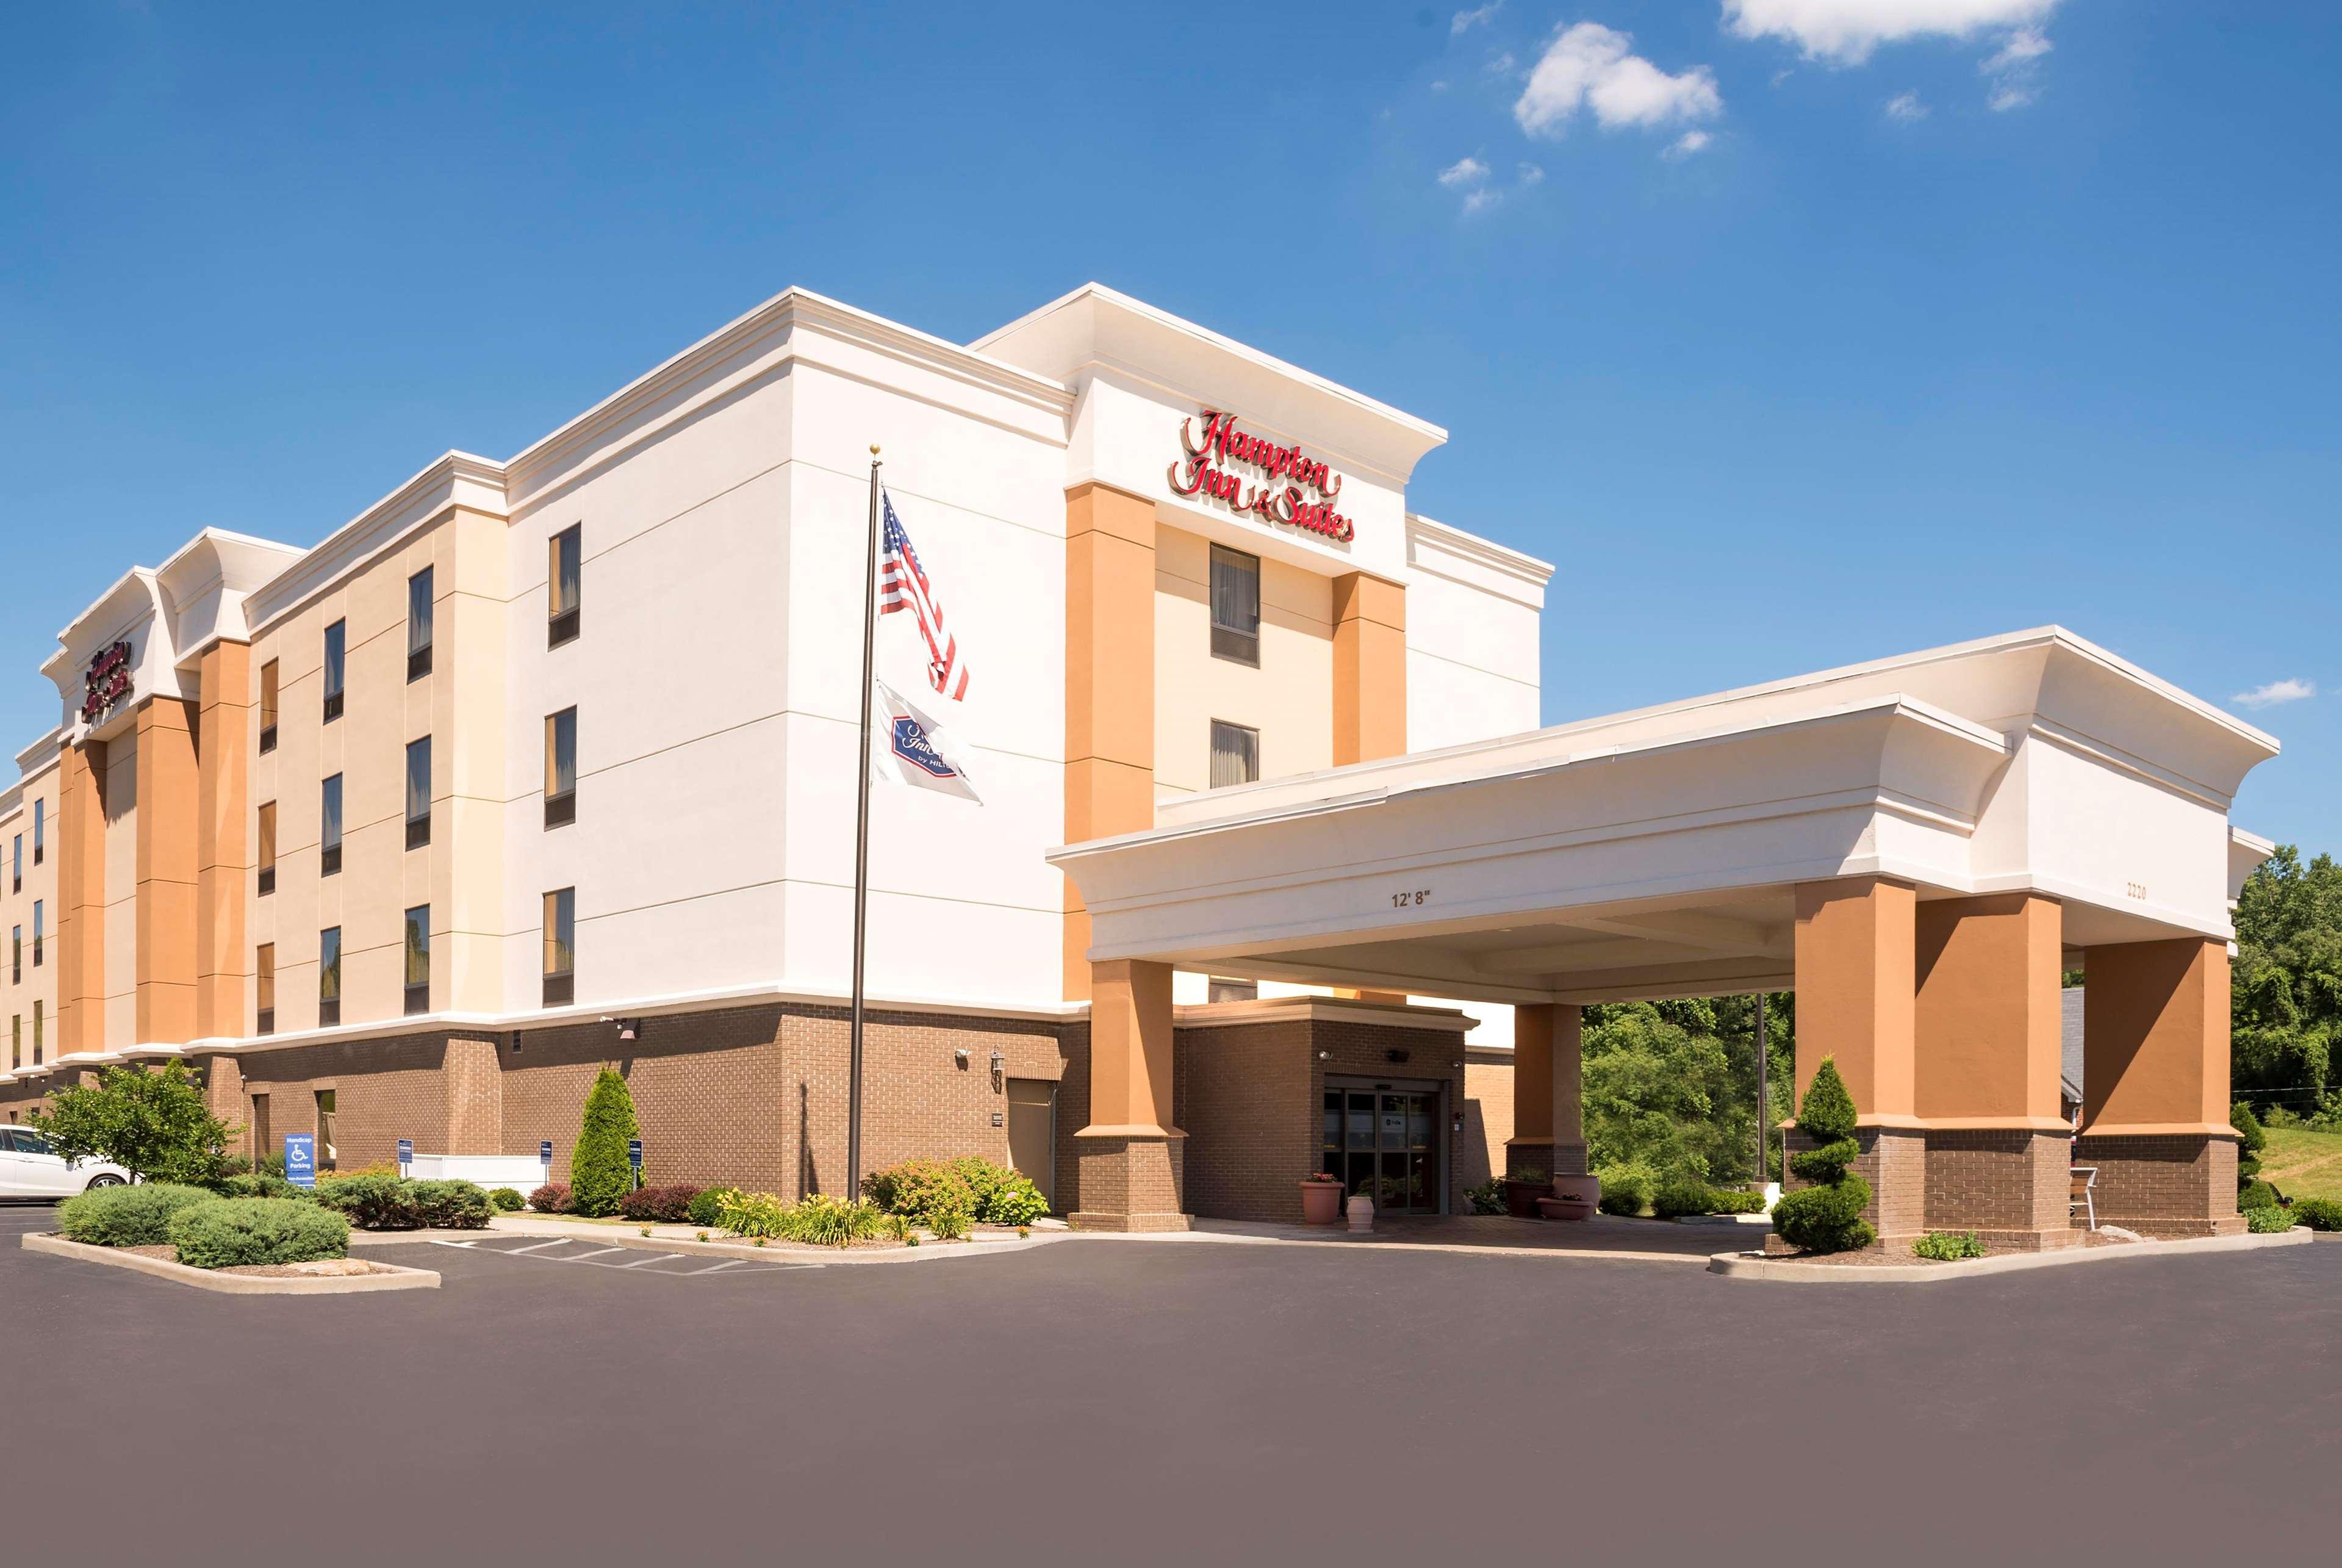 Hampton Inn & Suites Mansfield-South @ I-71 image 11